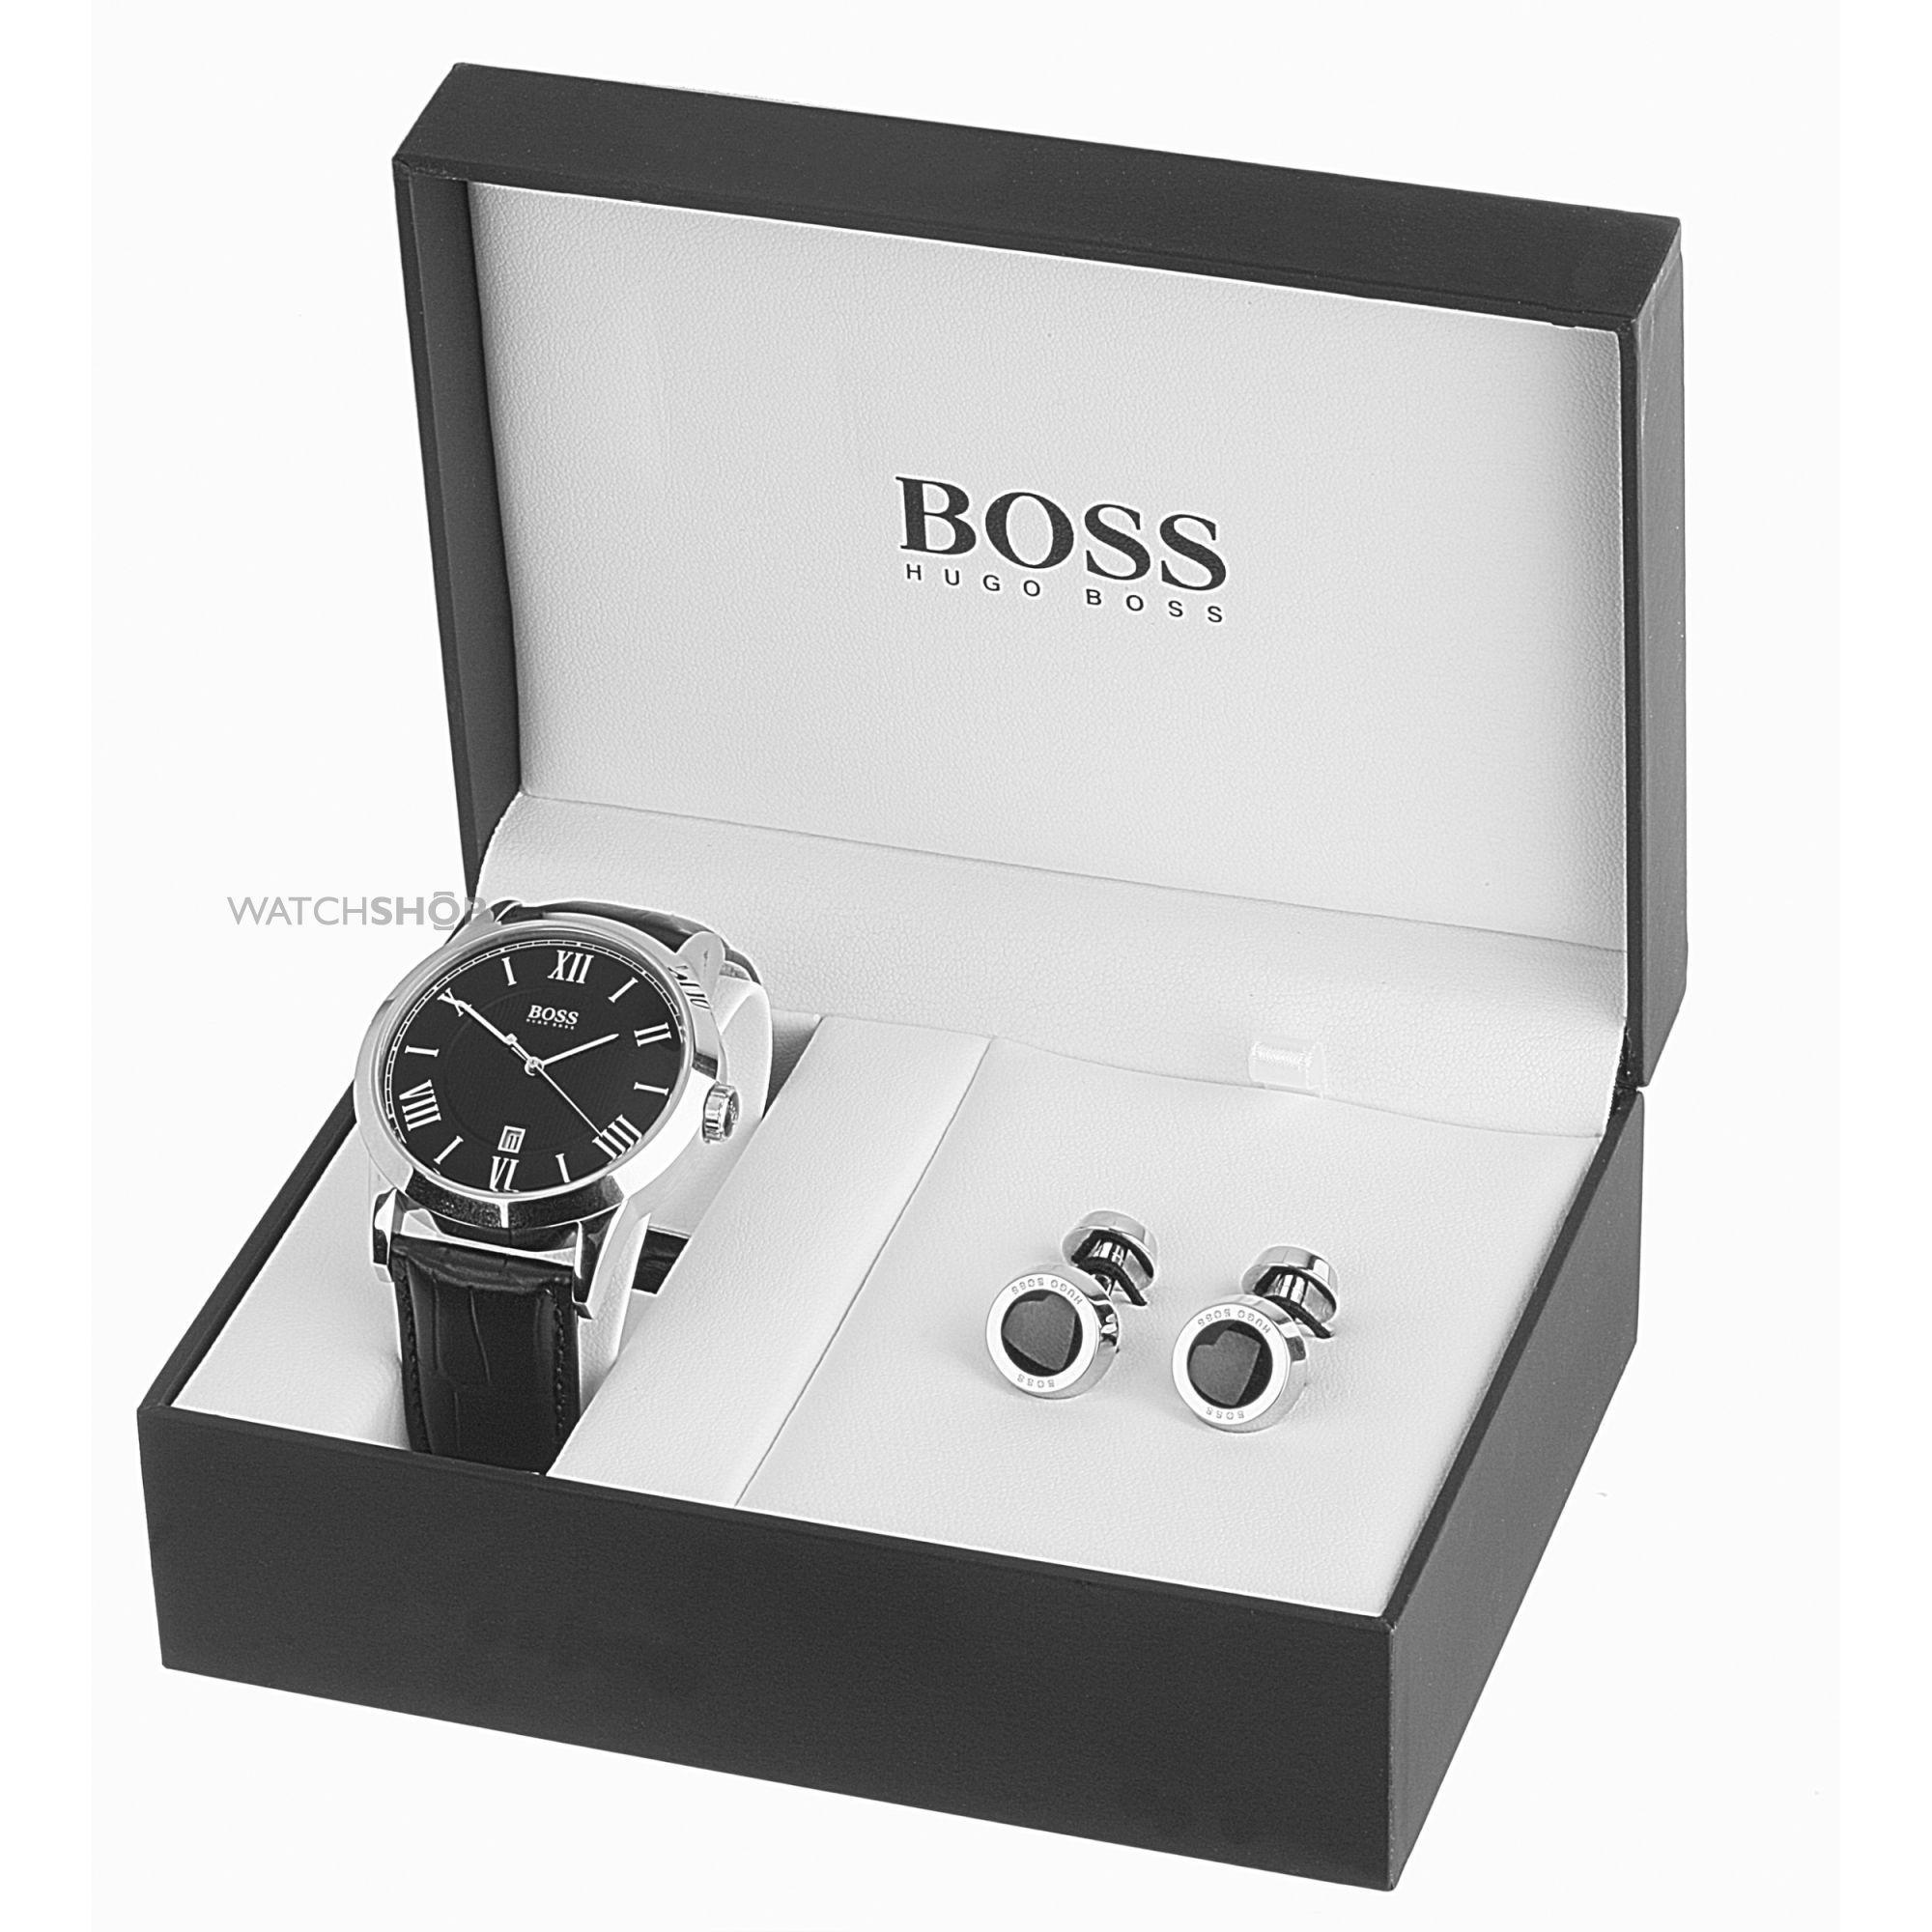 Mens Hugo Boss Cufflink Box Set Watch 210025 Hugo boss Hugo boss